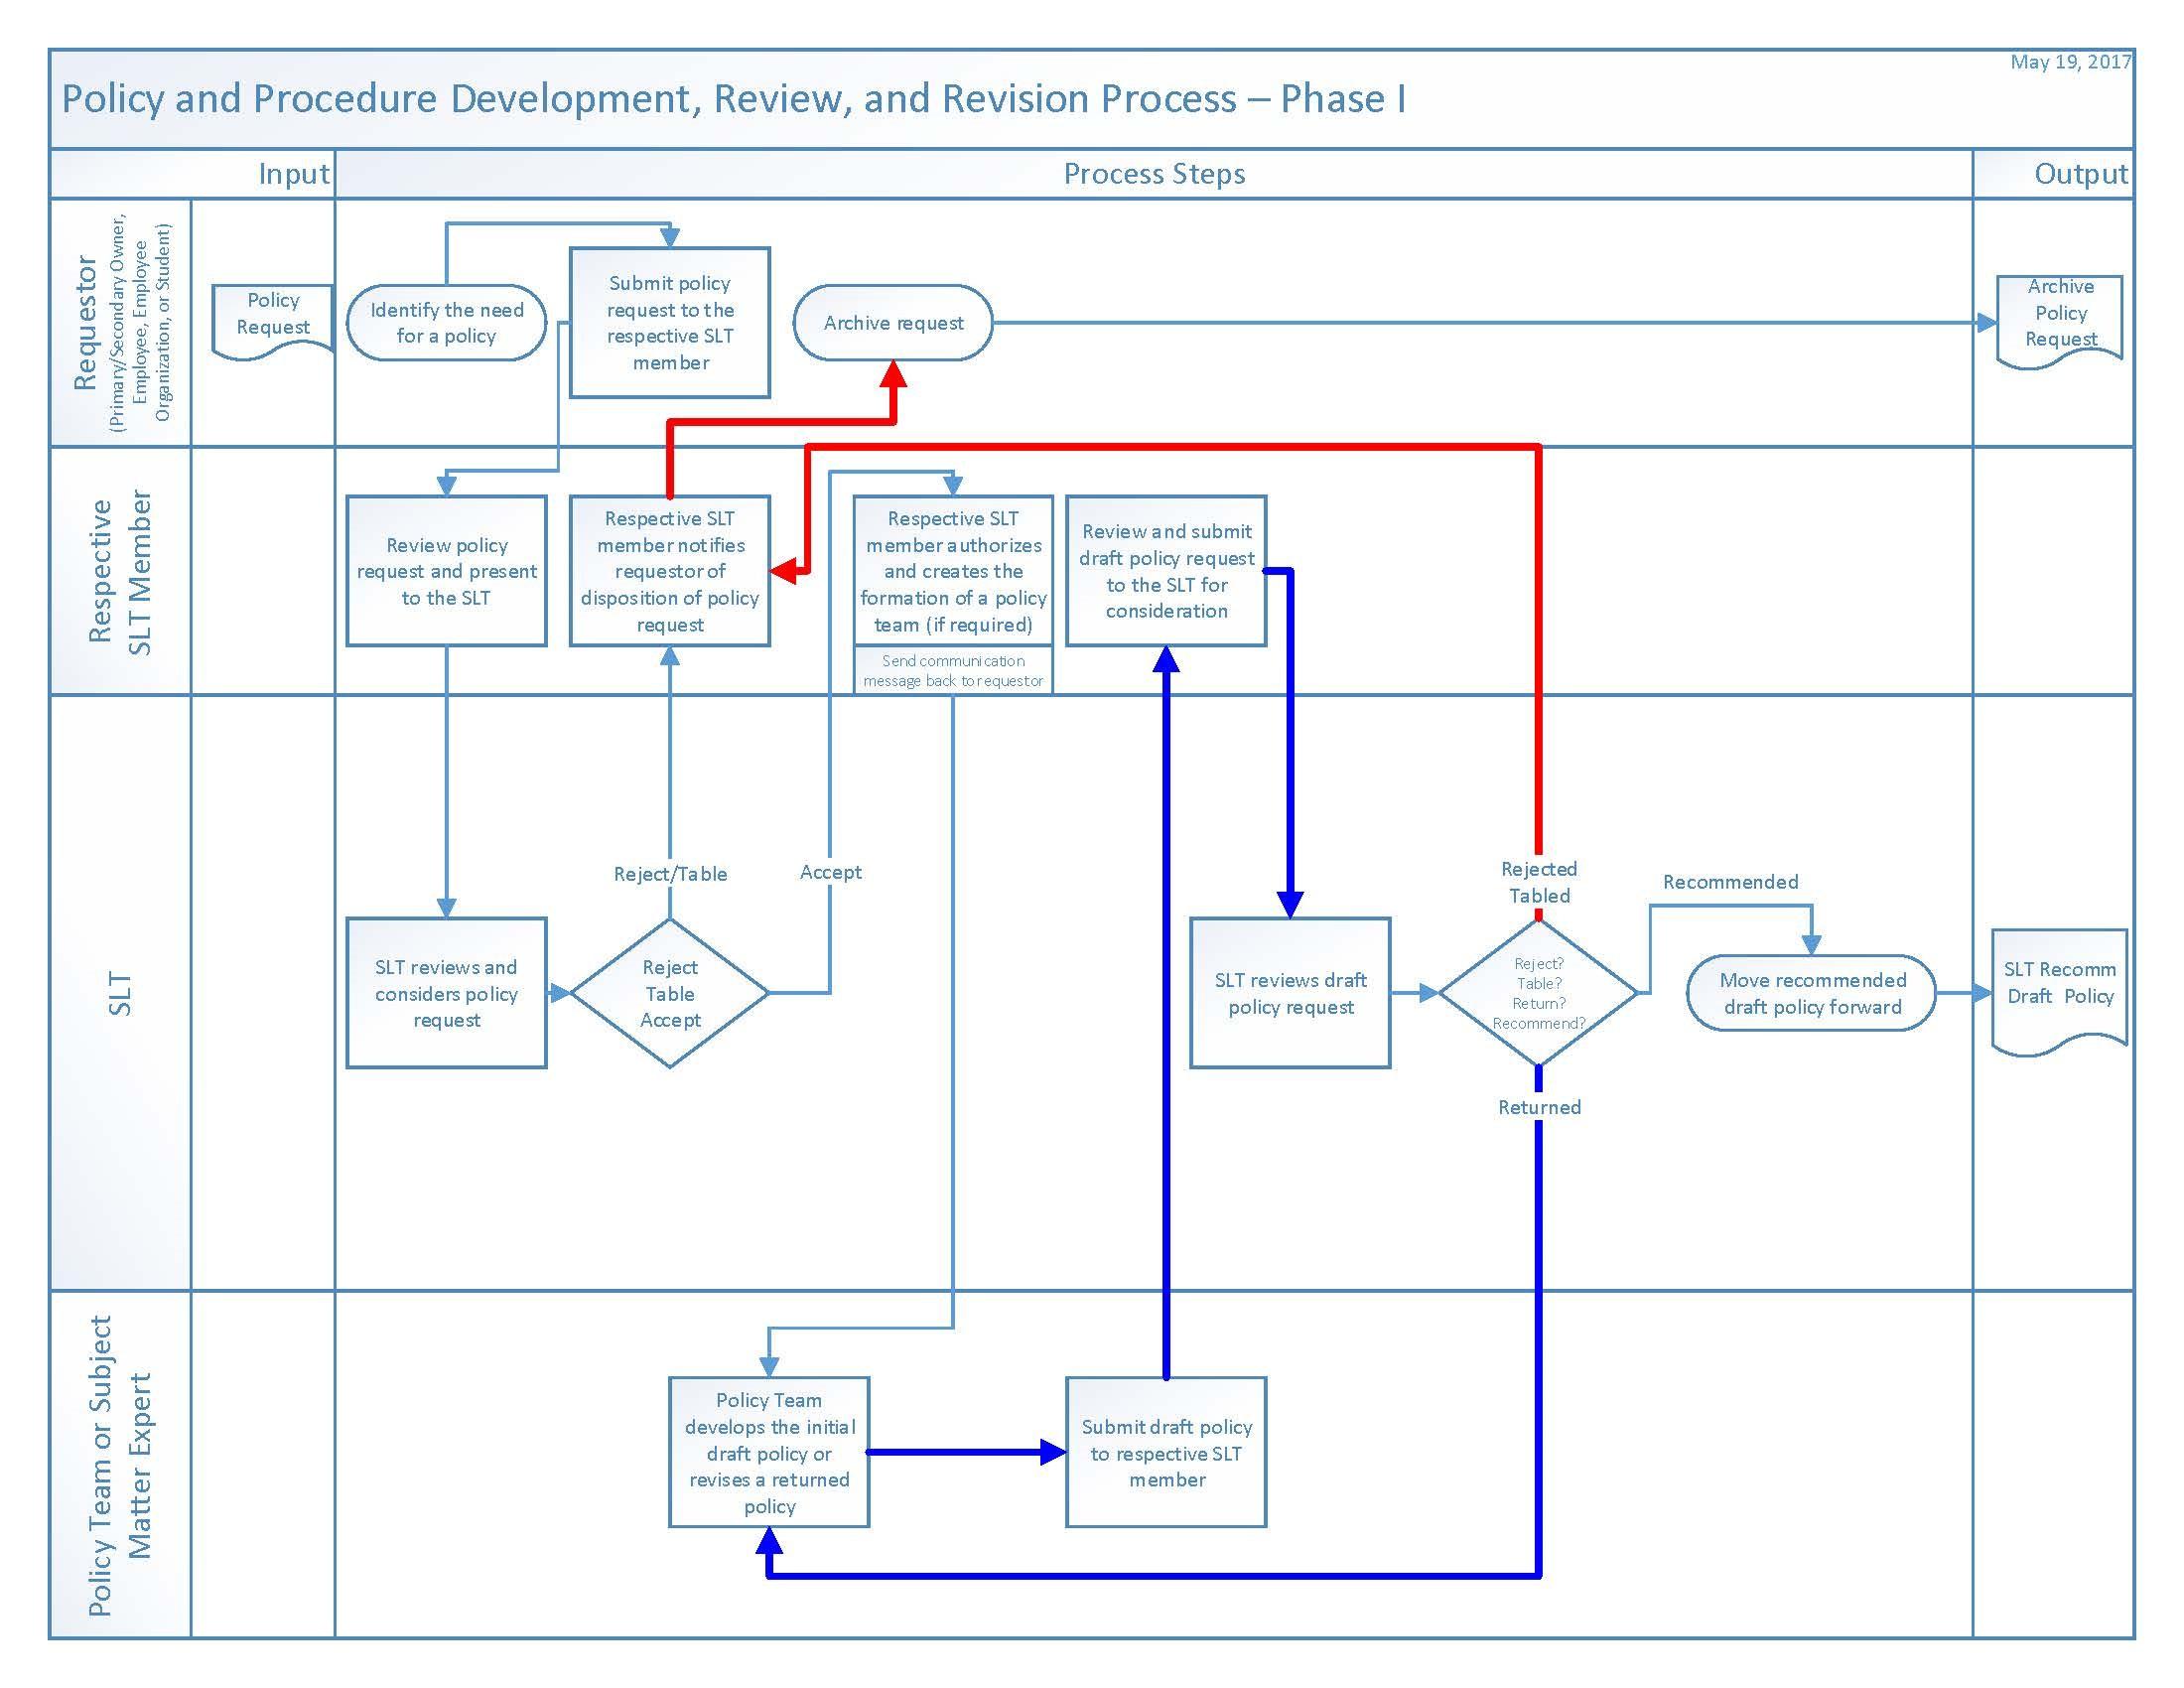 Policies & Procedures Phase 1